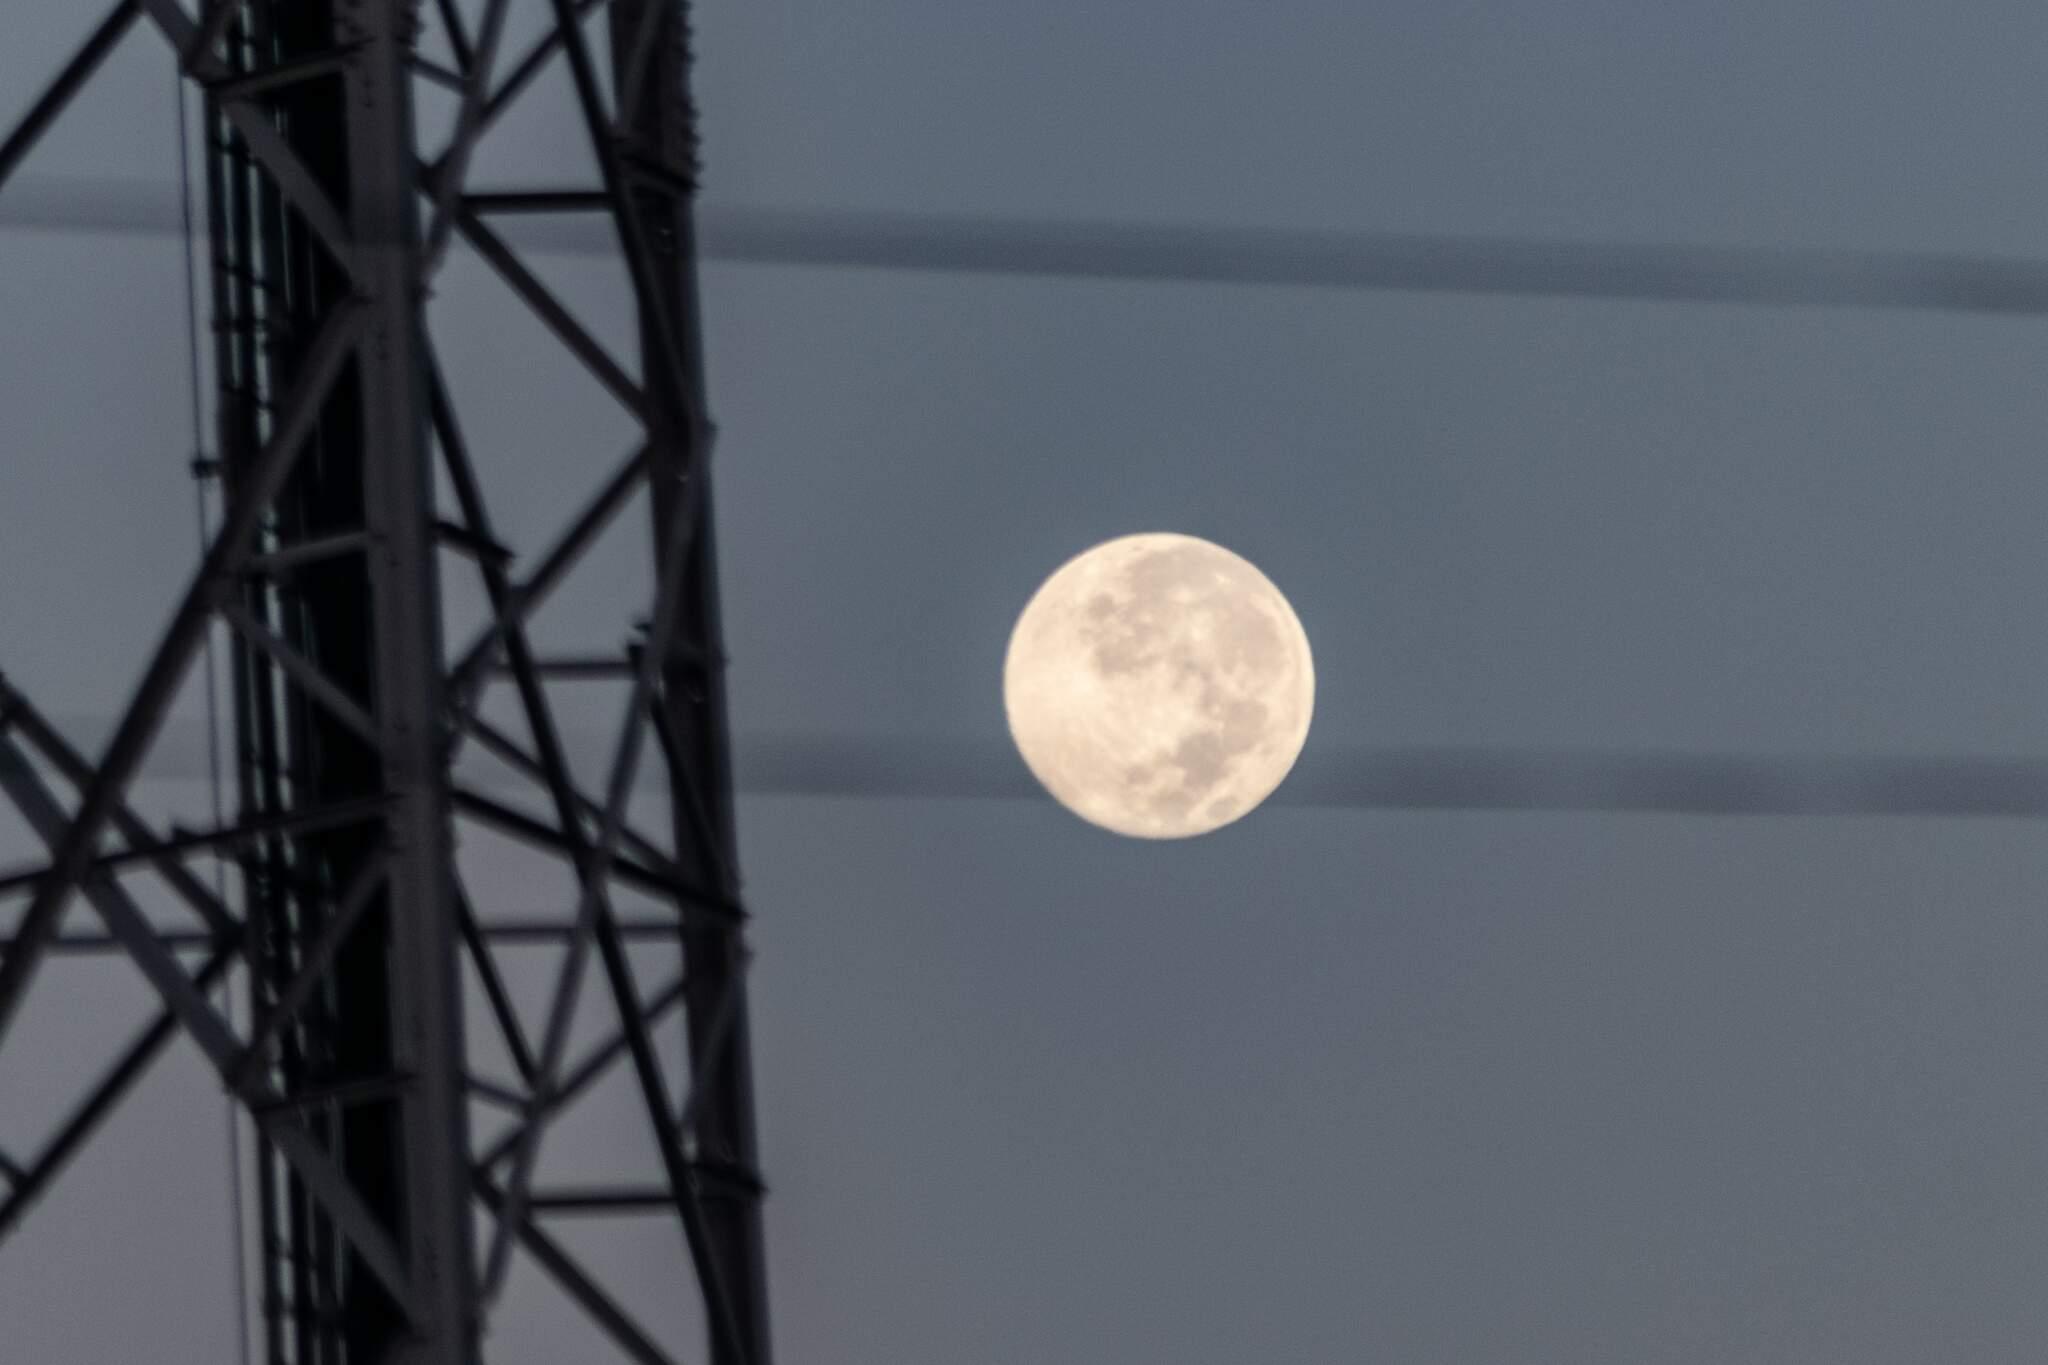 Lua vista no céu campo-grandense (Foto: Henrique Kawaminami/Arquivo)